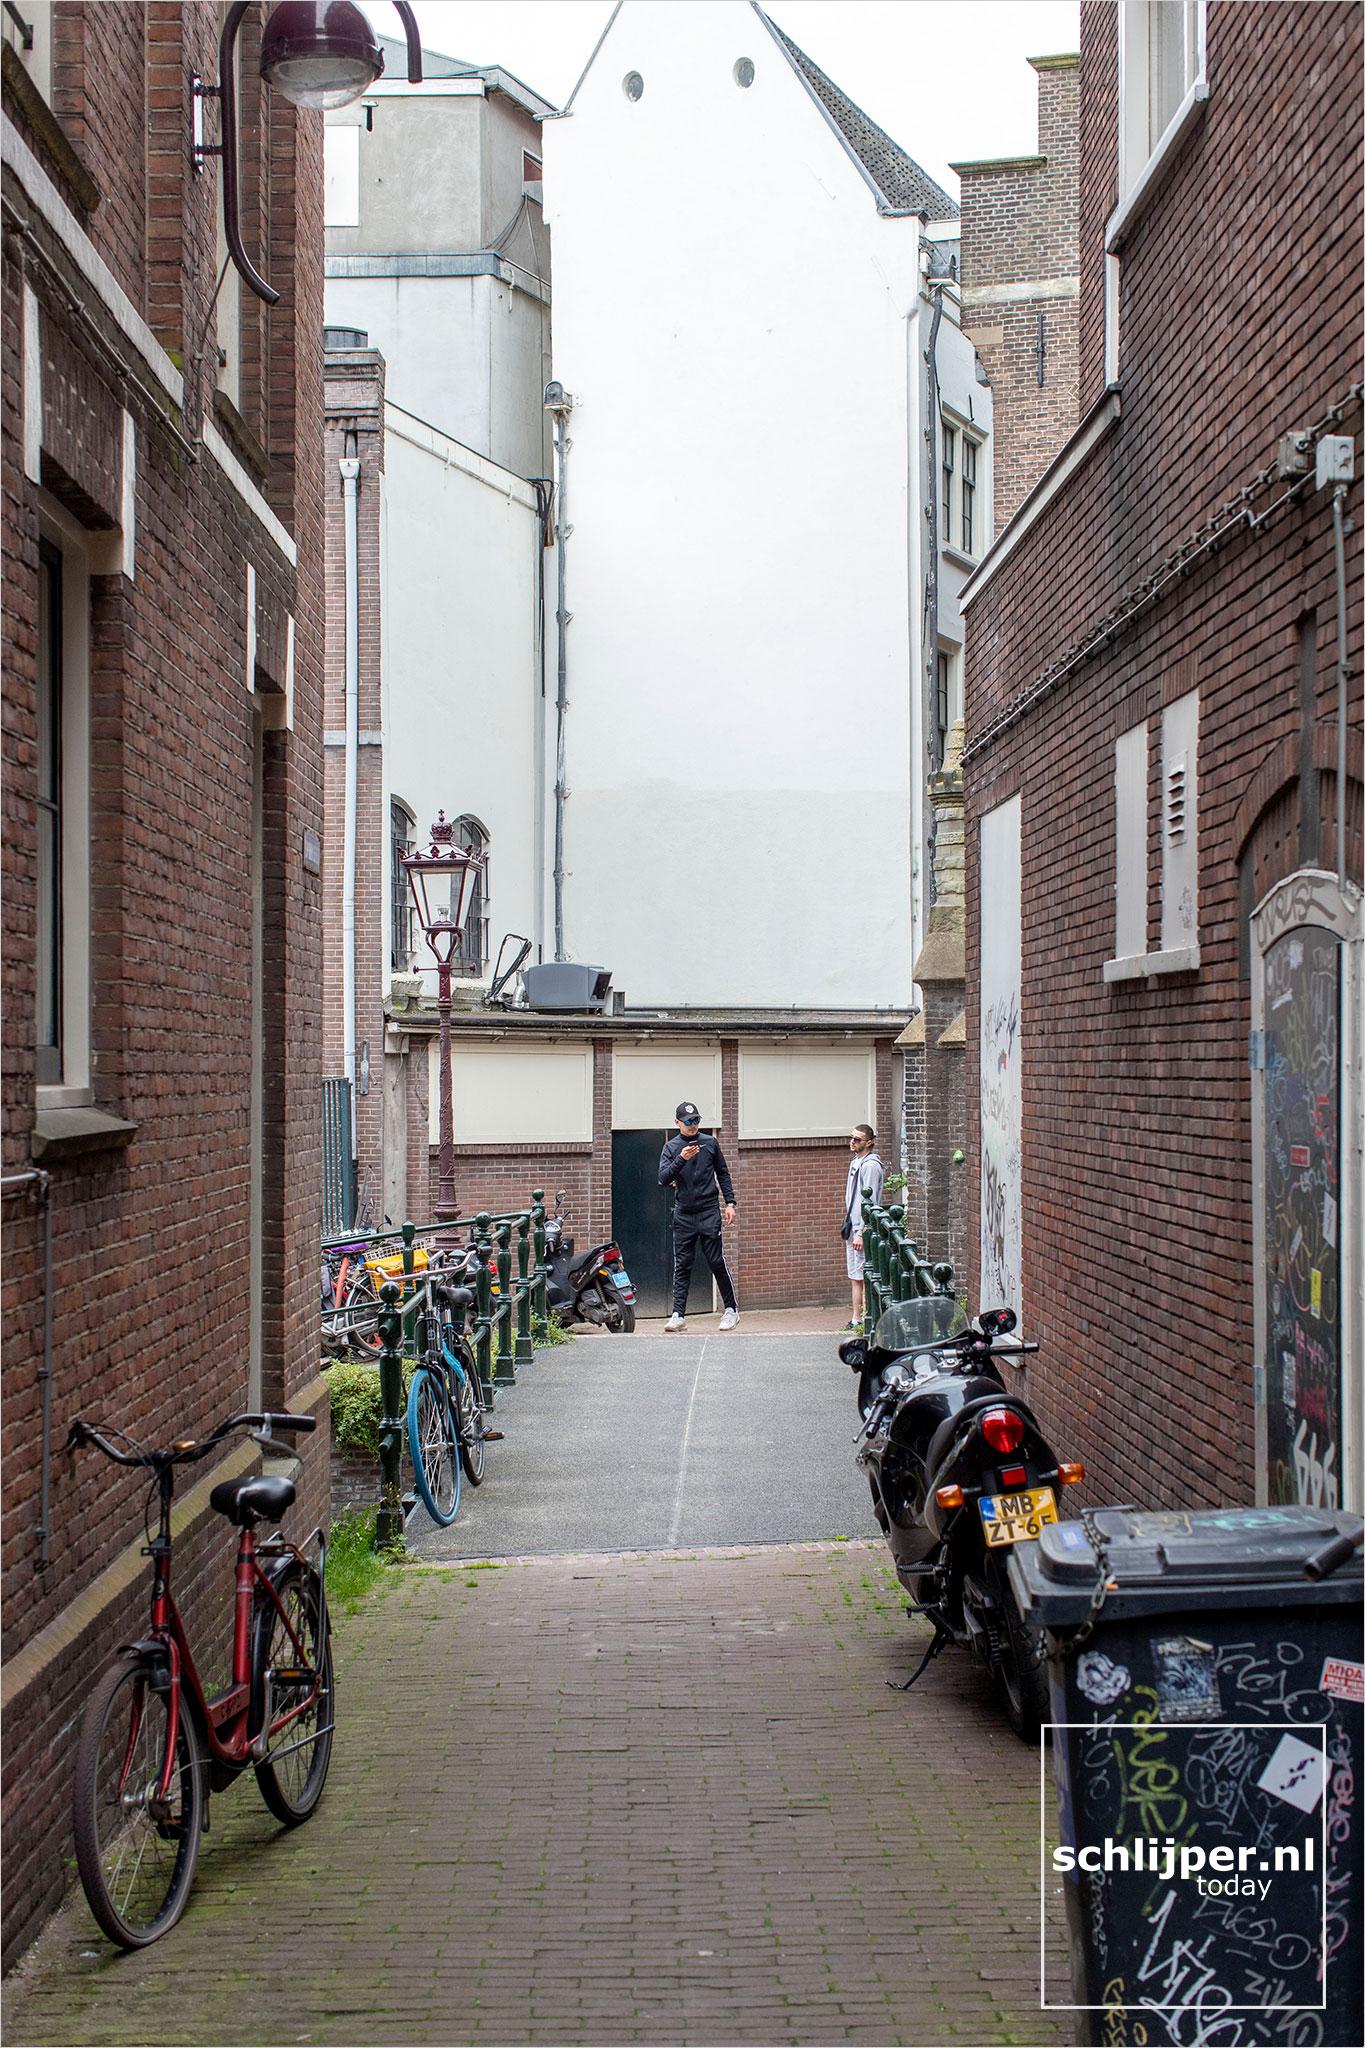 Nederland, Amsterdam, 21 juni 2020